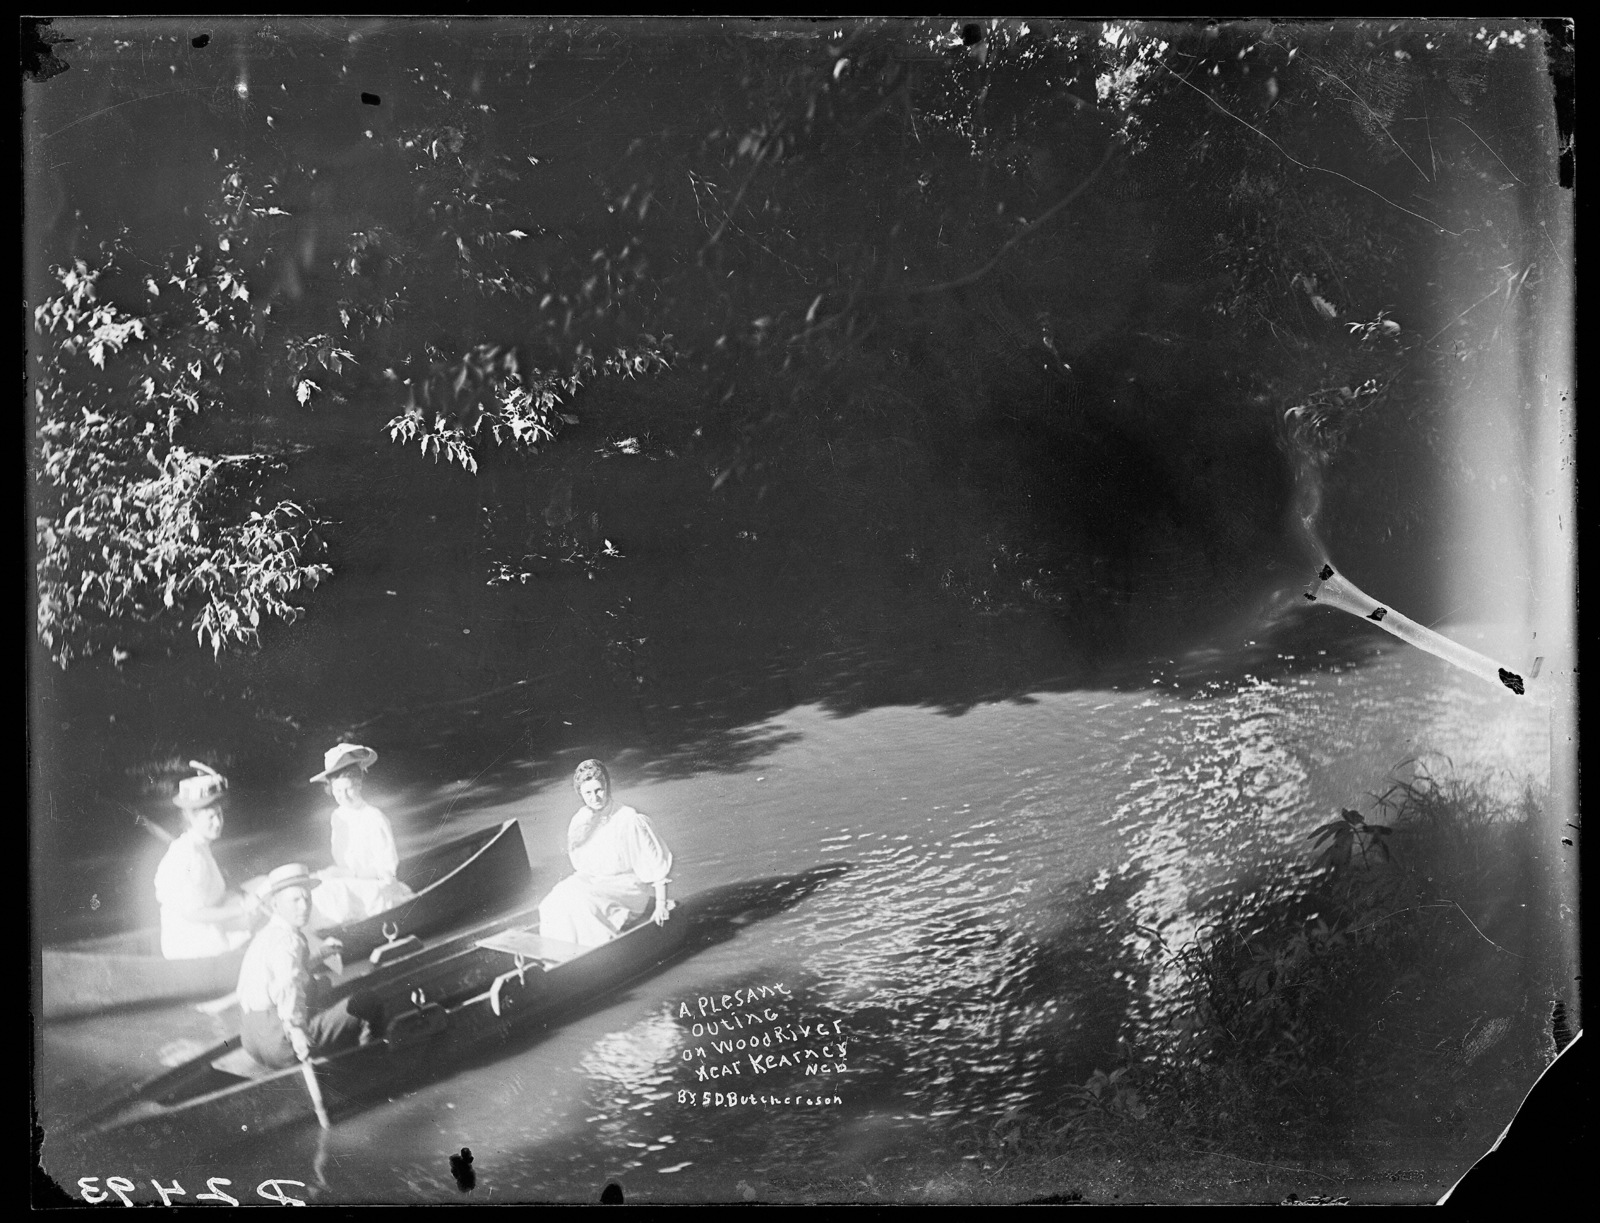 Three women and one man boating on the Wood River north of Kearney, Nebraska.